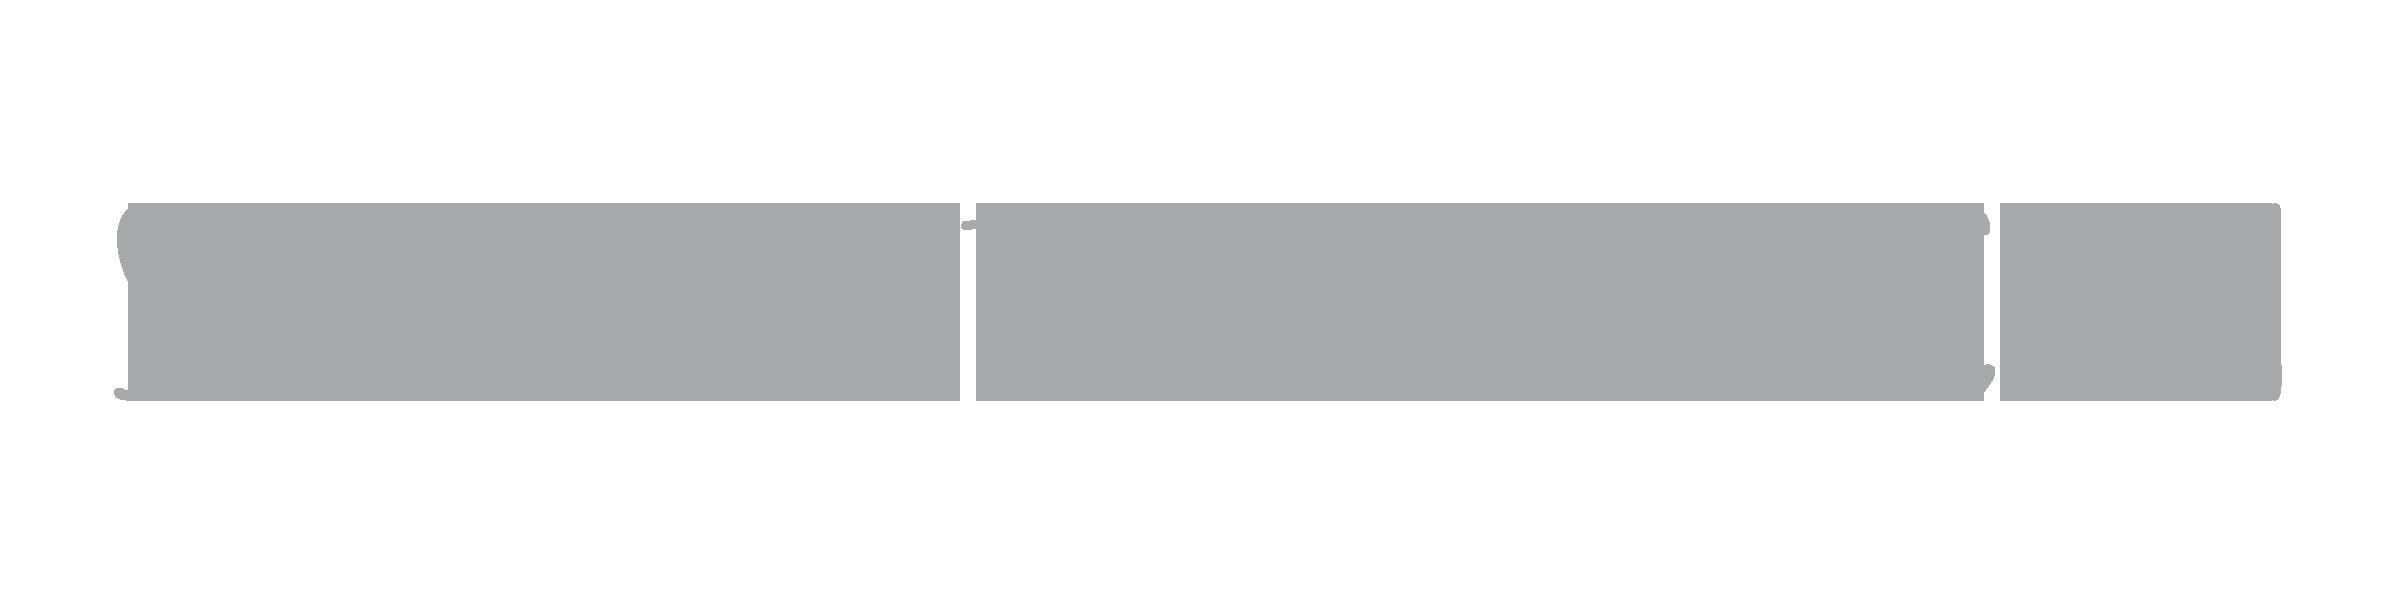 text-greysunn-shopmetalstamping.png